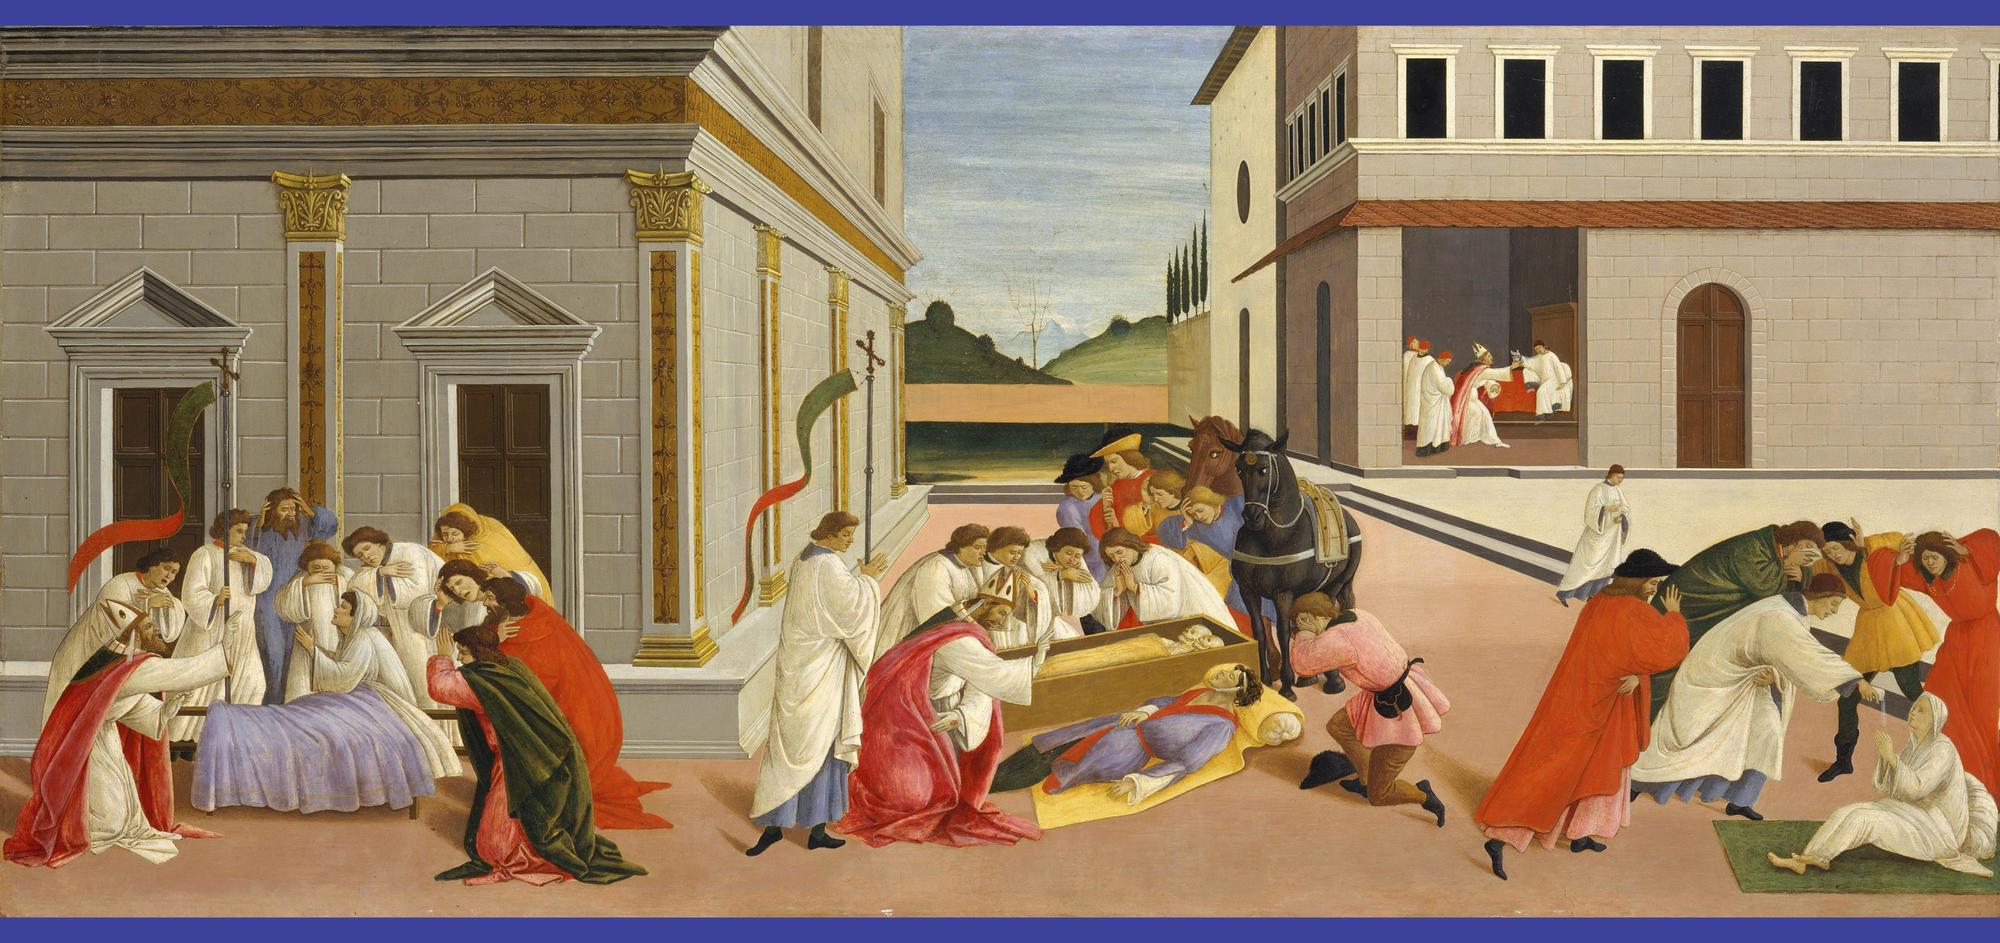 Sandro Botticelli (Italian, 1444 or 1445-1510), Three Miracles of Zenobius, about 1500. Tempera on panel, 67.3 x 150.5 cm (26 1/2 x 59 1/4 in.). Metropolitan Museum of Art, New York